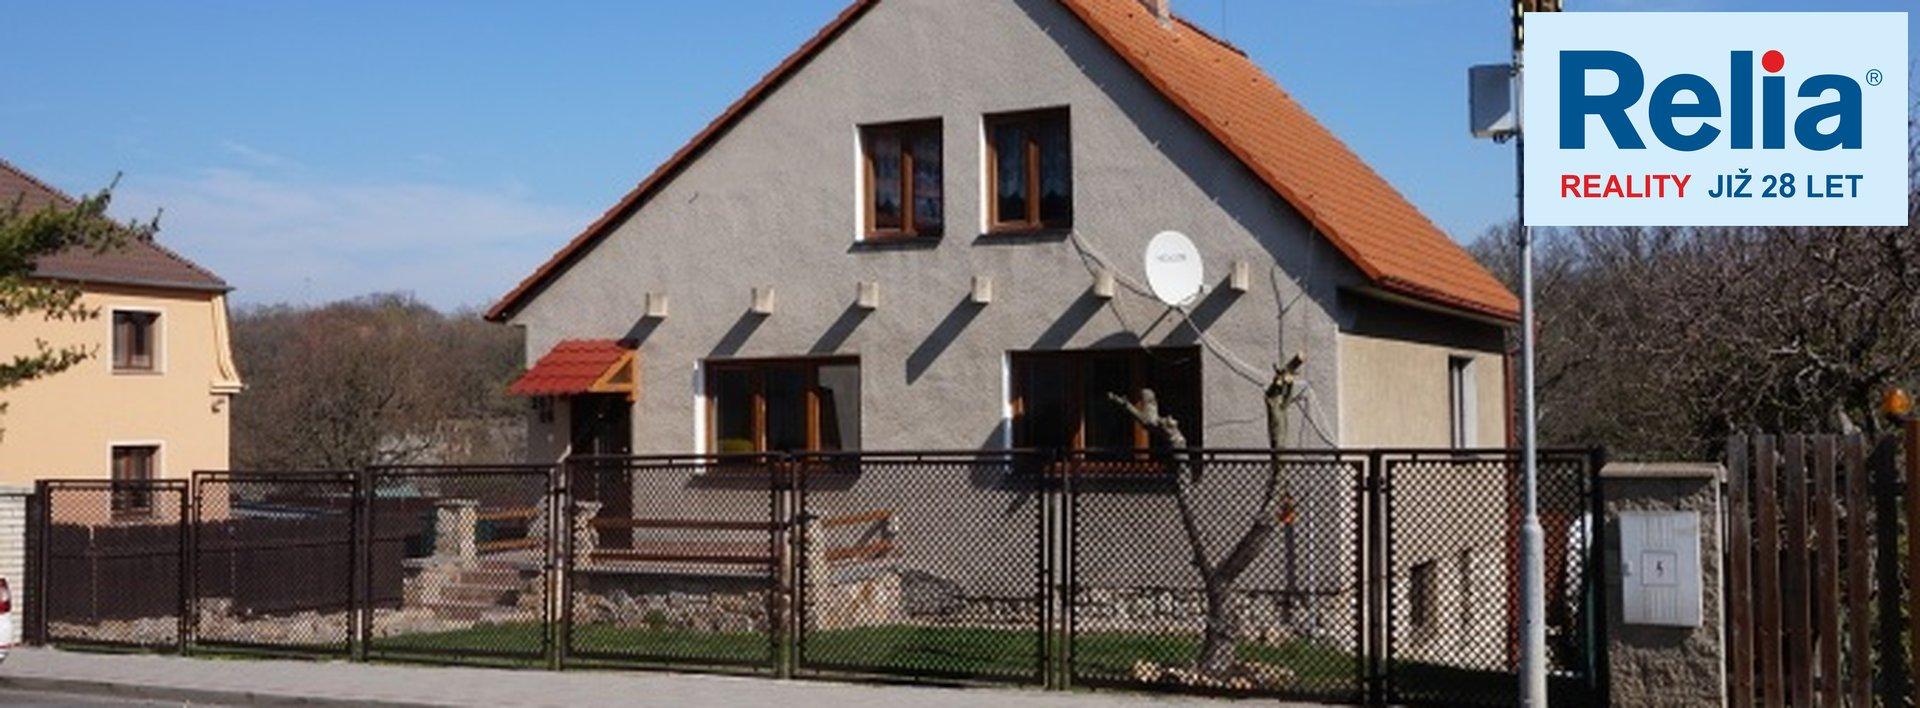 Prodej, rodinný dům se zahradou, 1 999 m2,  Pražská ul., Bílina., Ev.č.: N48728